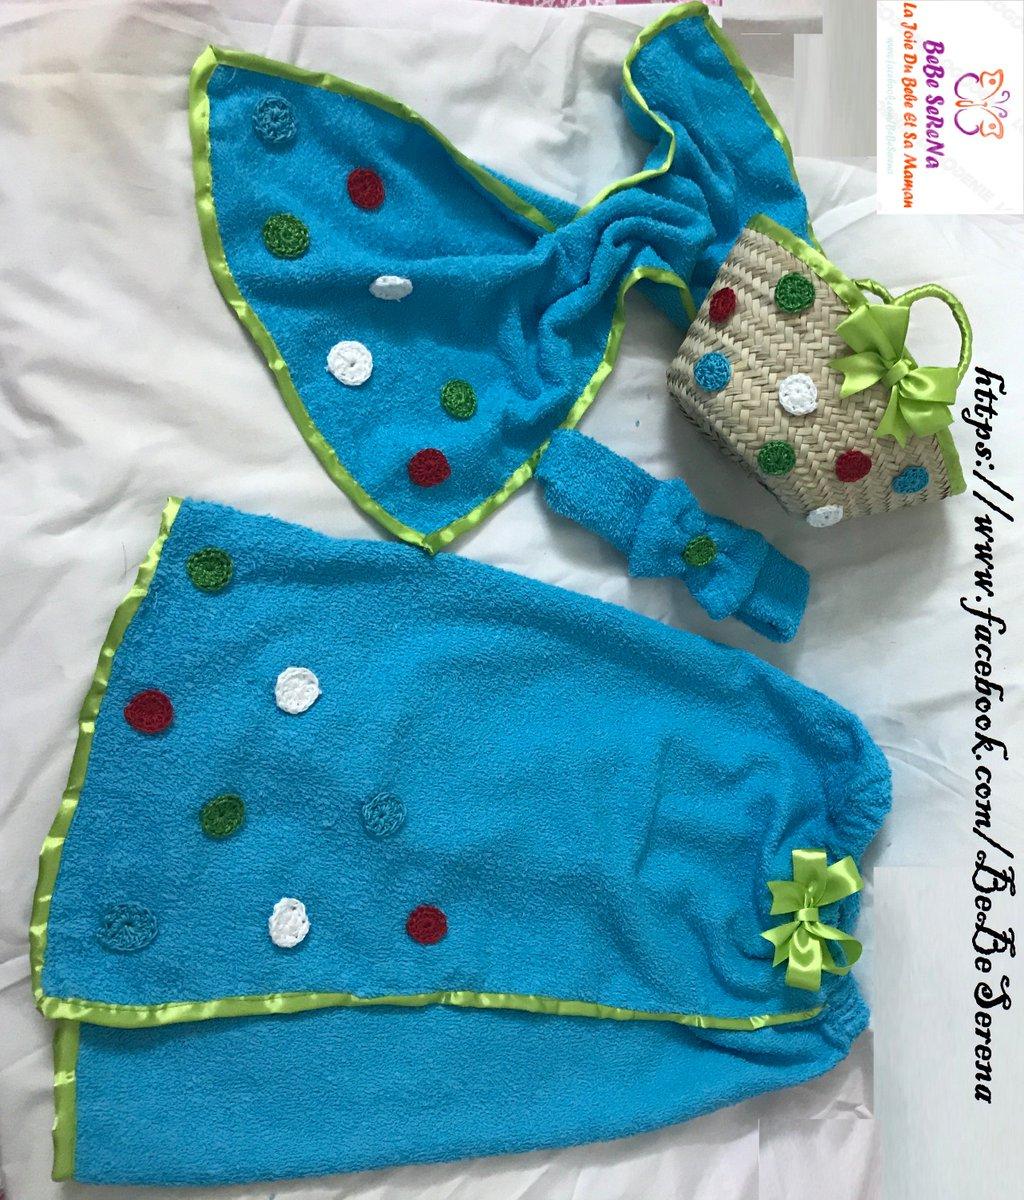 New #summer #sortie_de_plage #enfant #couffin #serre_tète #crochet #commander by #serena_crochet<br>http://pic.twitter.com/zQQgnDeSlG